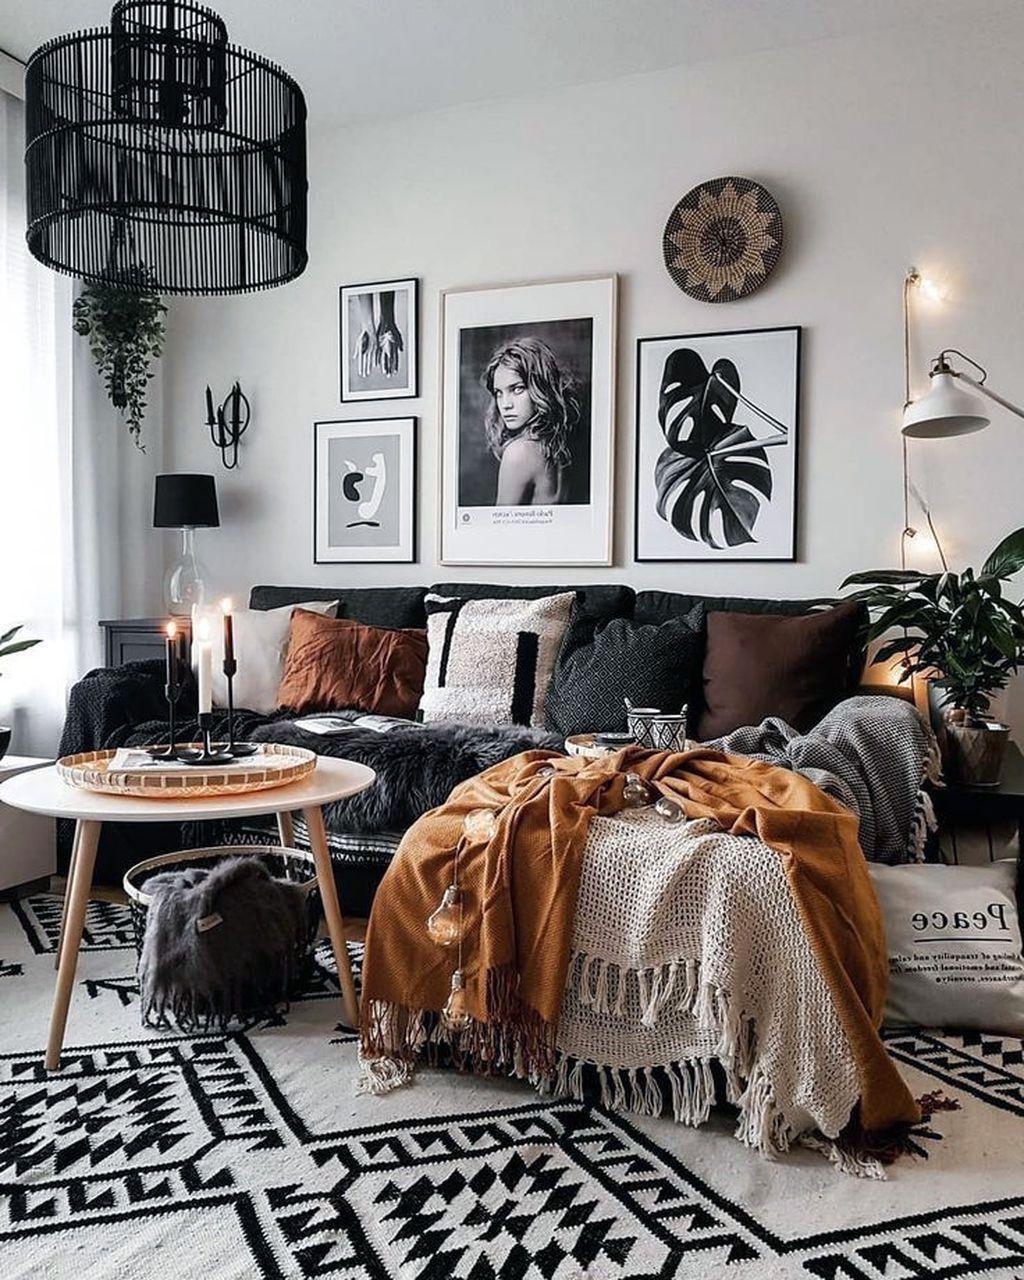 uncover more entrancing boho scandinavian living rooms ideas 27 28 marvelous scandinavia in on boho chic decor living room bohemian kitchen id=40284